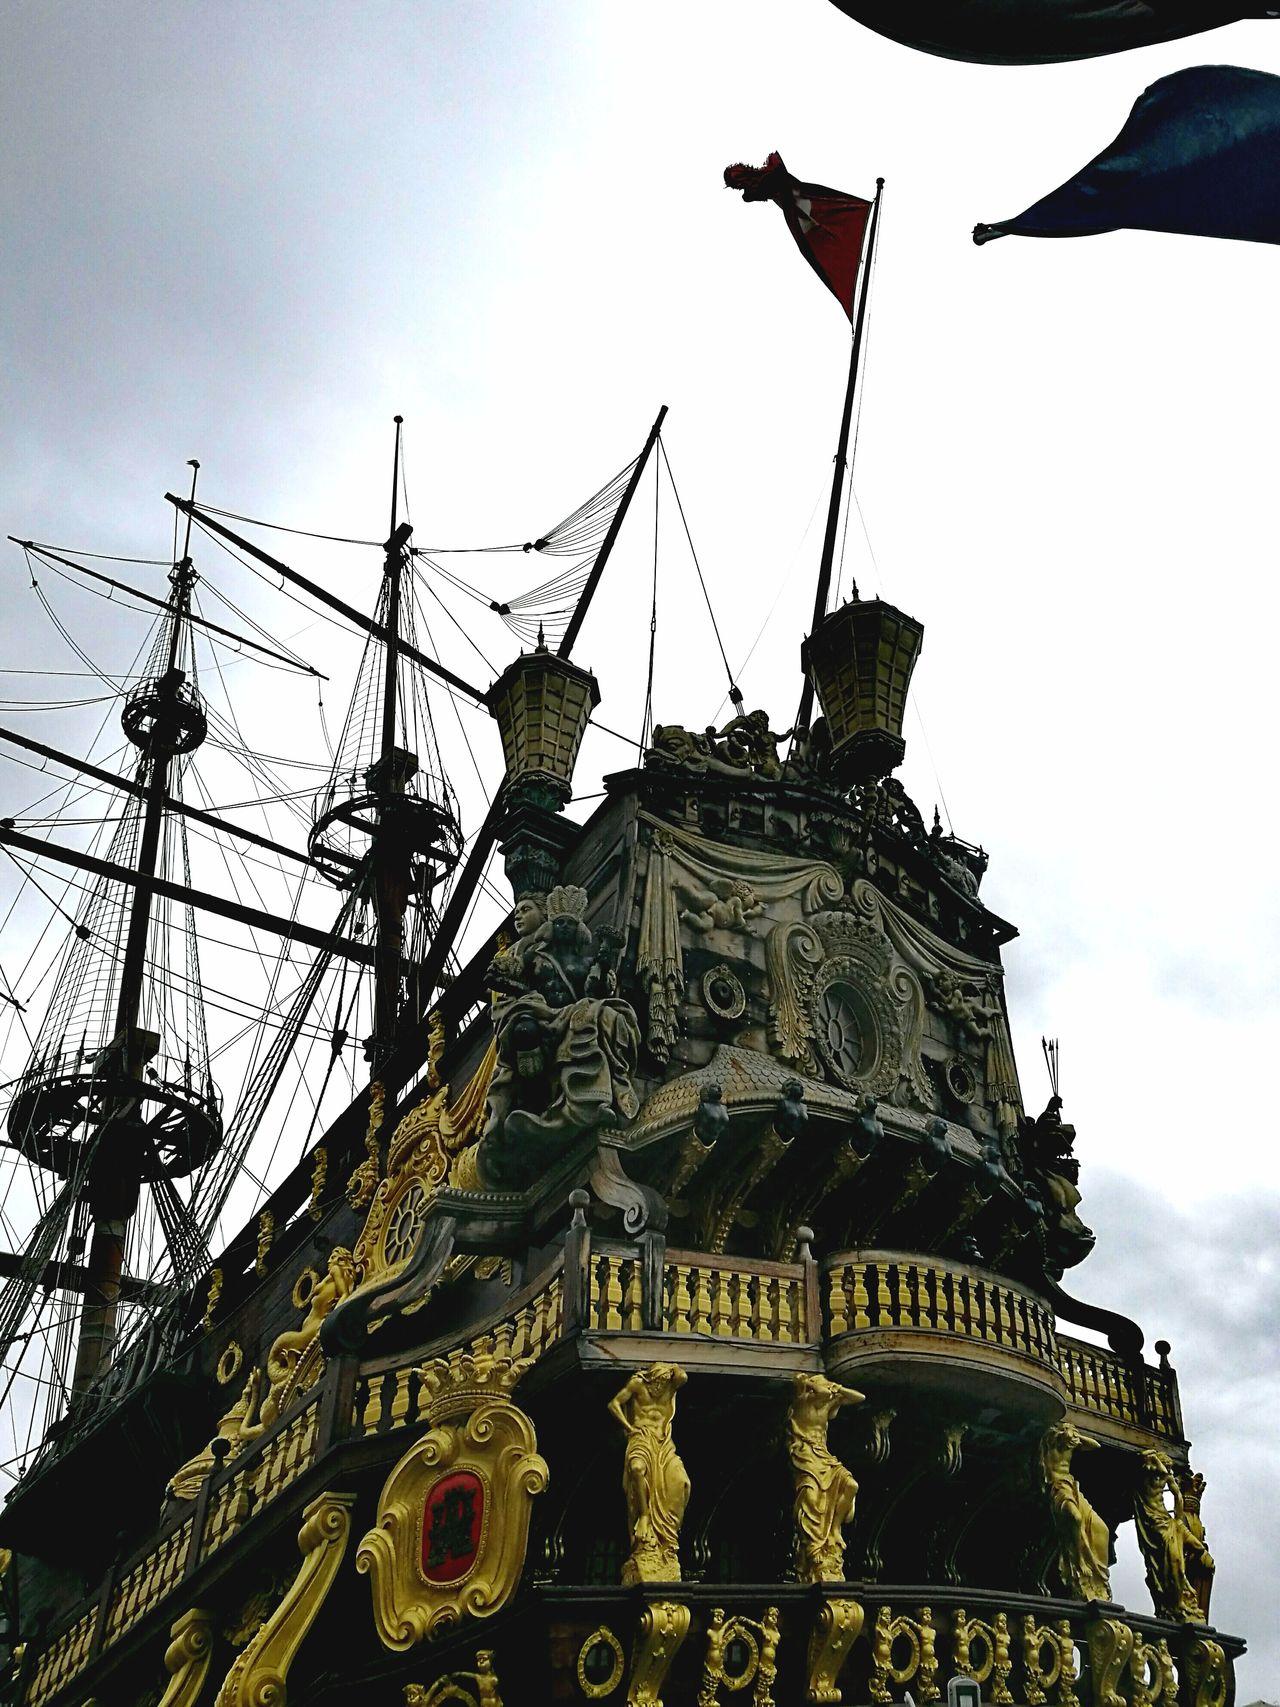 Outdoors Day Vessel In Port Pirateship  Genoa, Italy, Europe, Liguria Porto Antico,Genova Pirates Roman Polanski